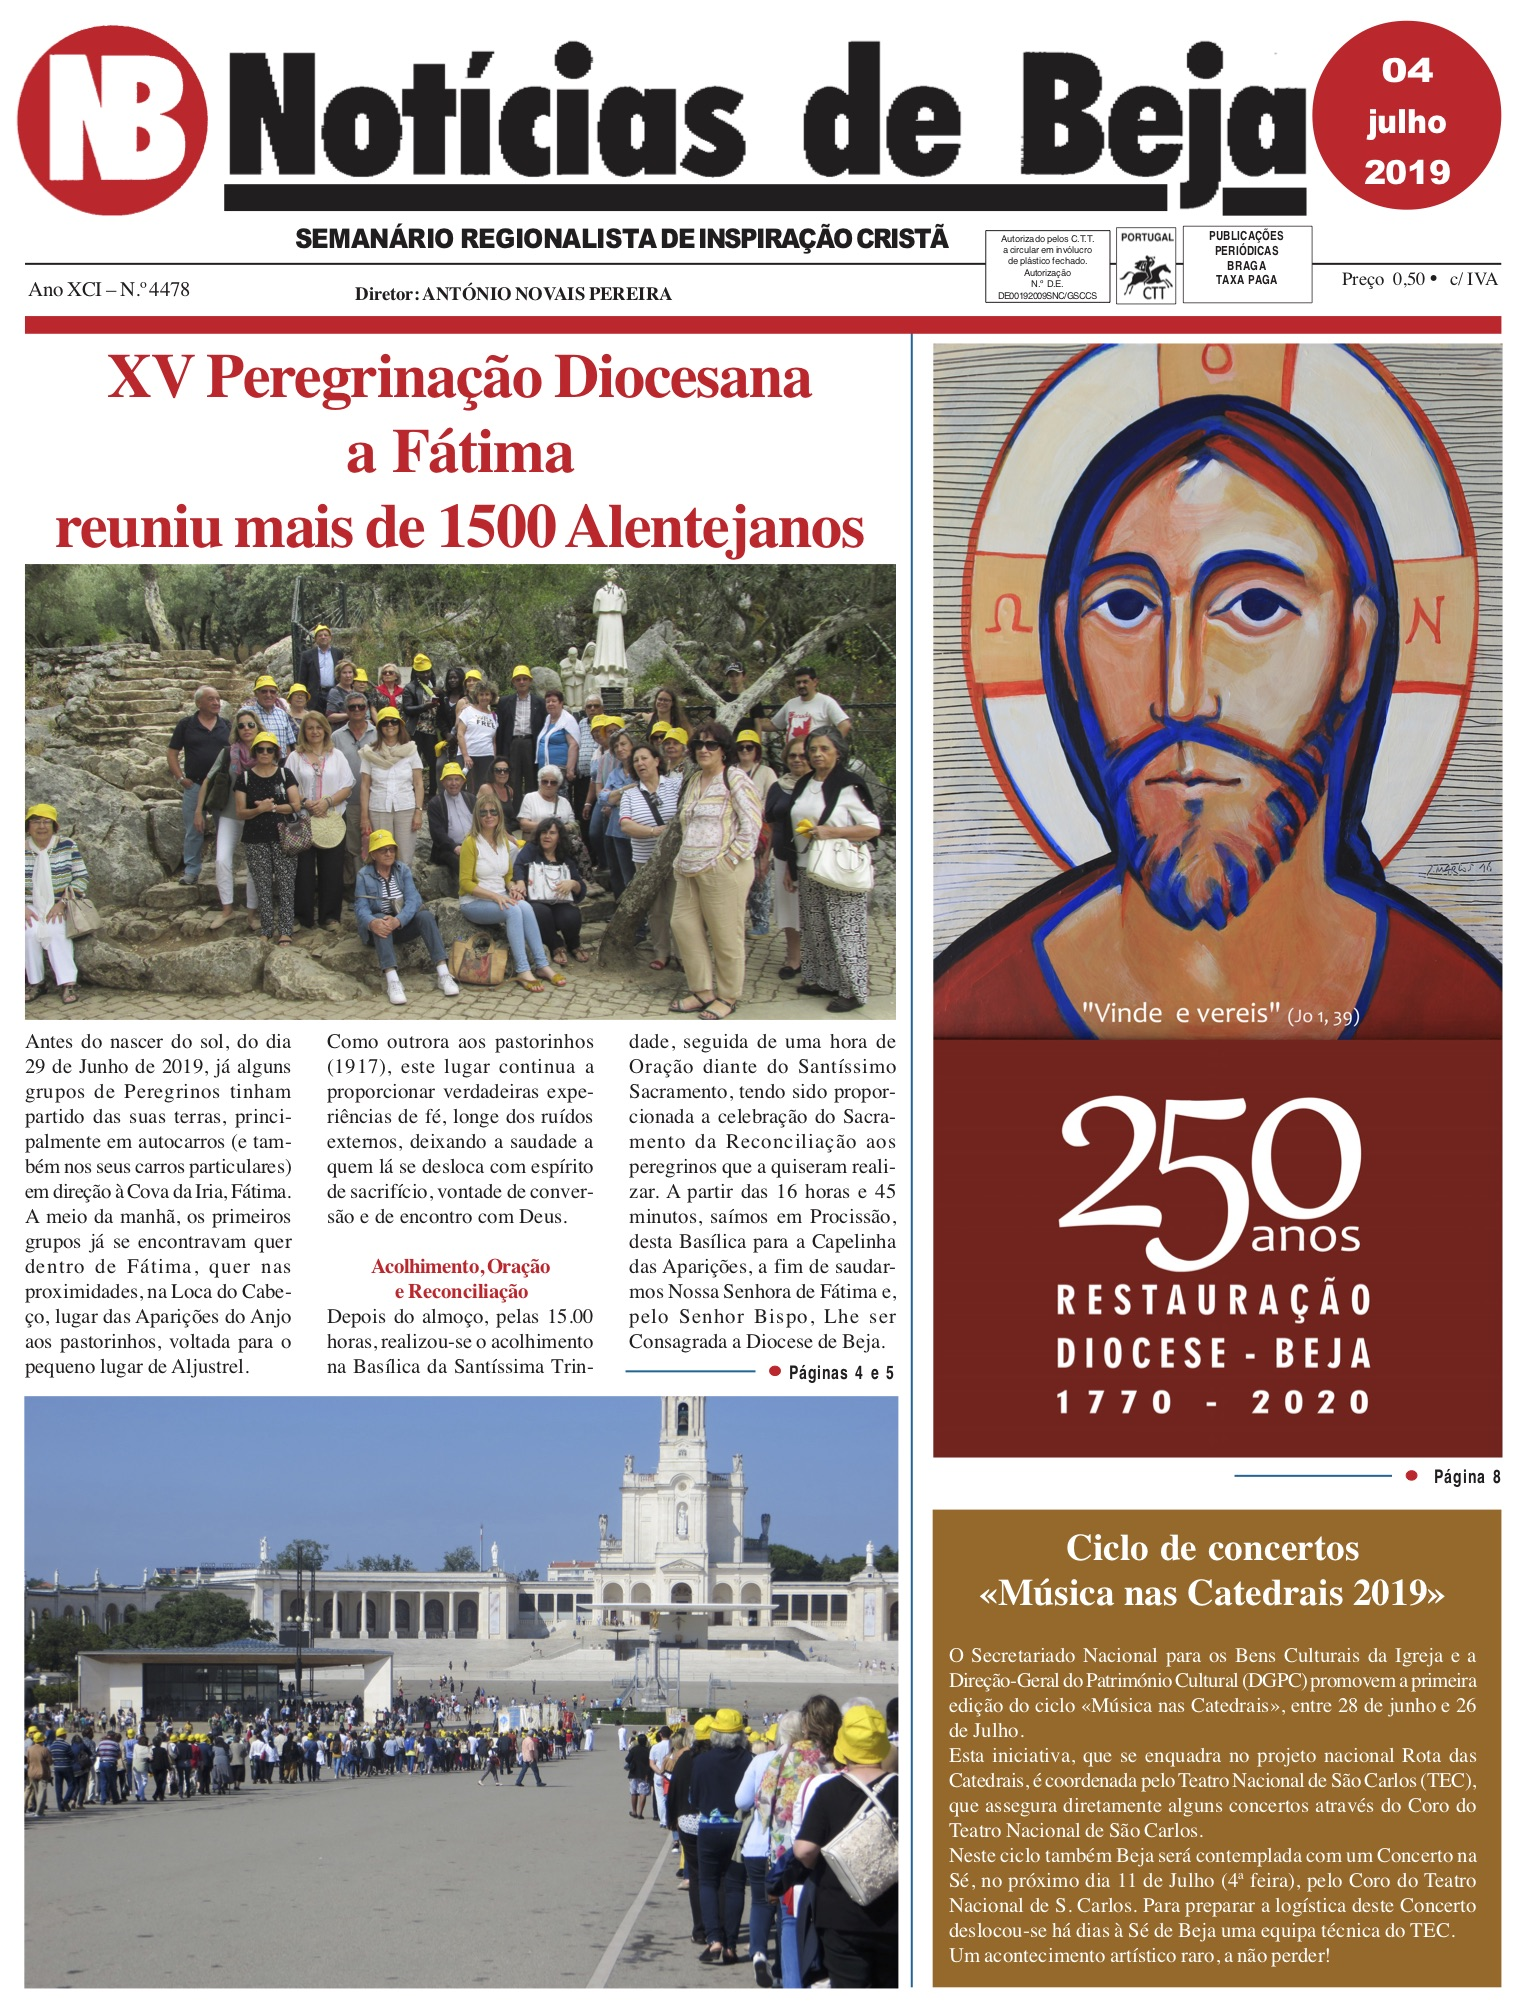 Jornal Notícias de Beja de 04 de Julho de 2019